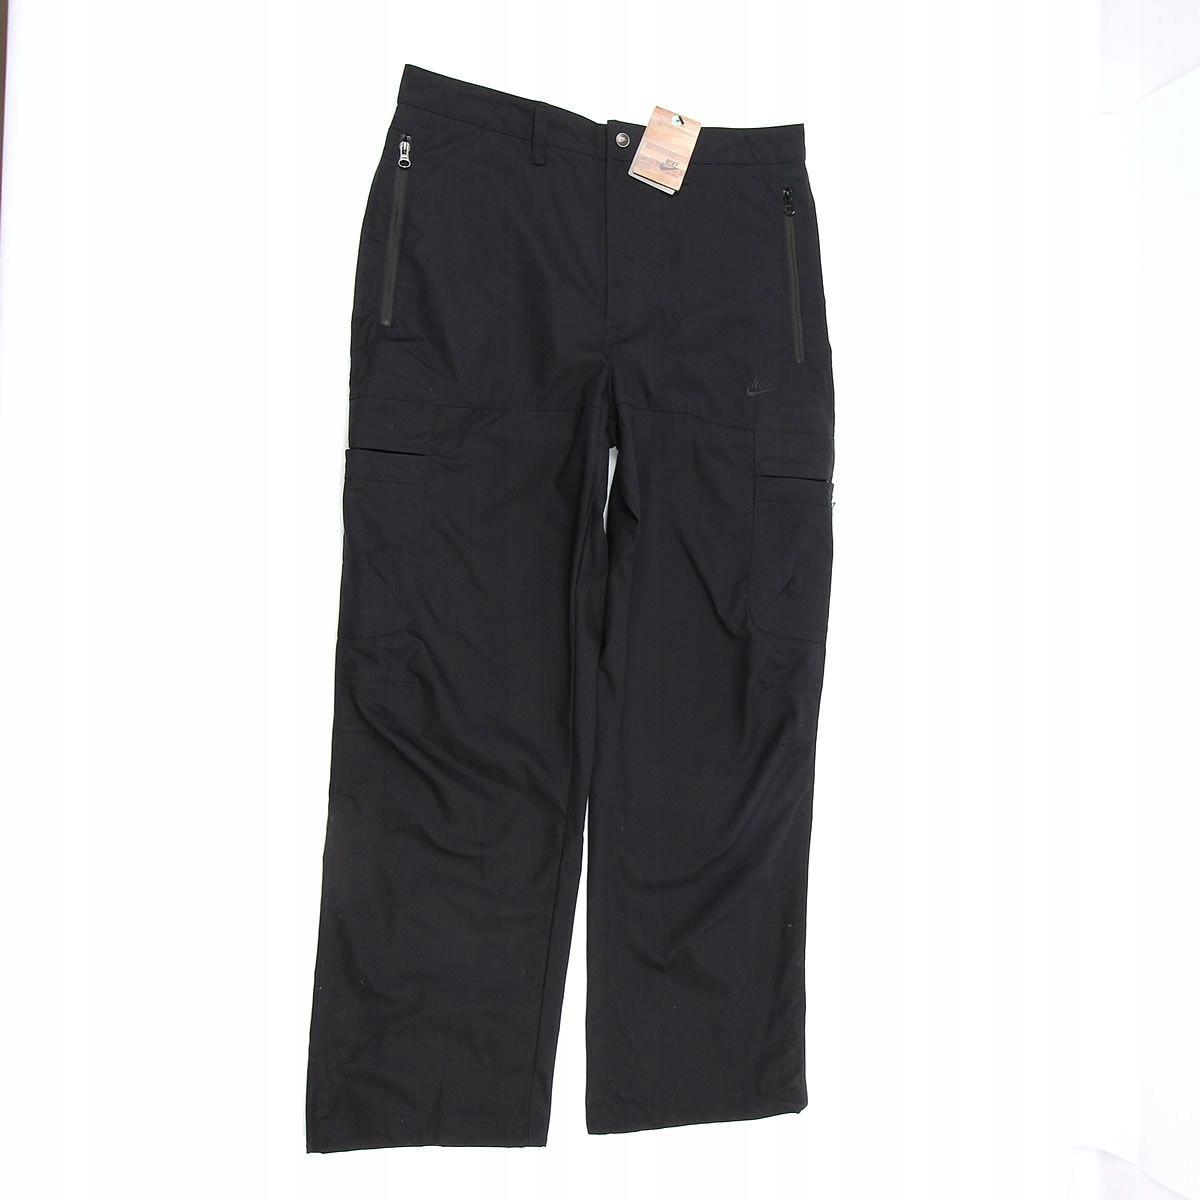 Spodnie męskie Nike L